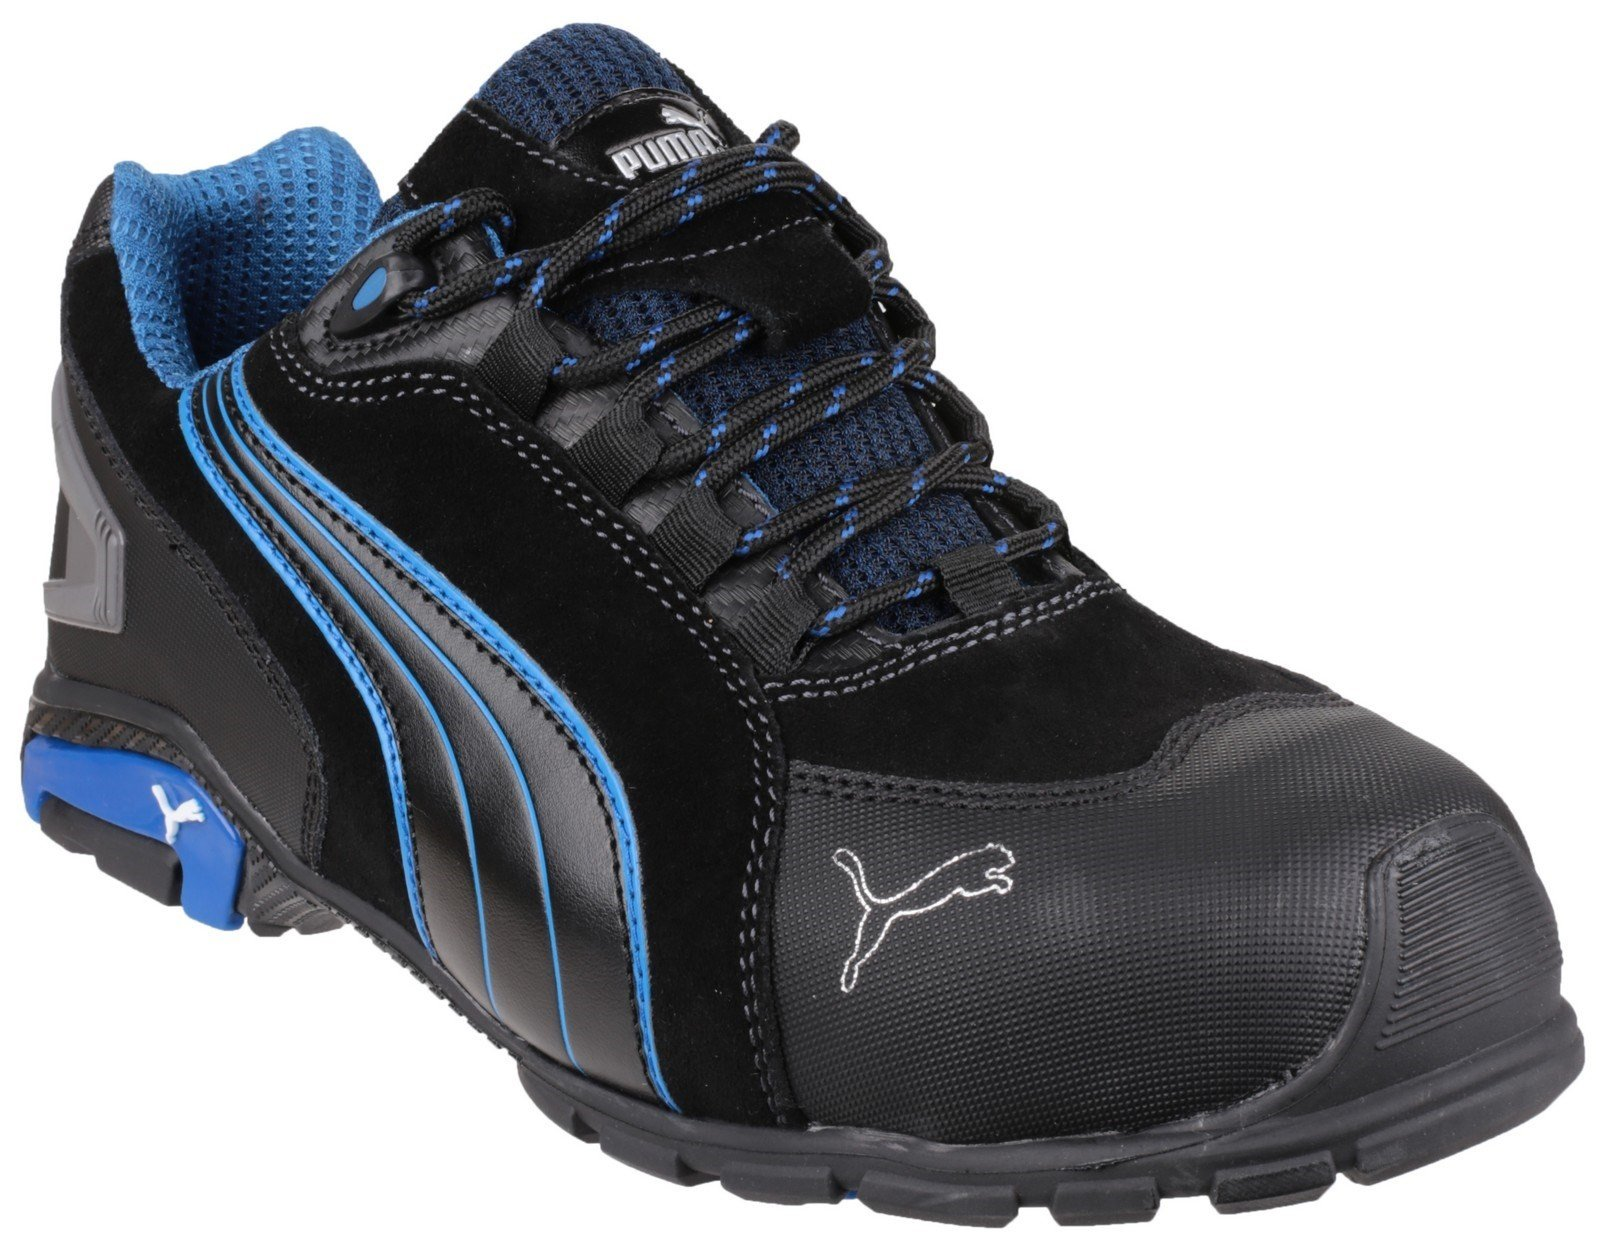 Puma Safety Unisex Rio Low Lace-up Trainer Black 23096 - Black 6